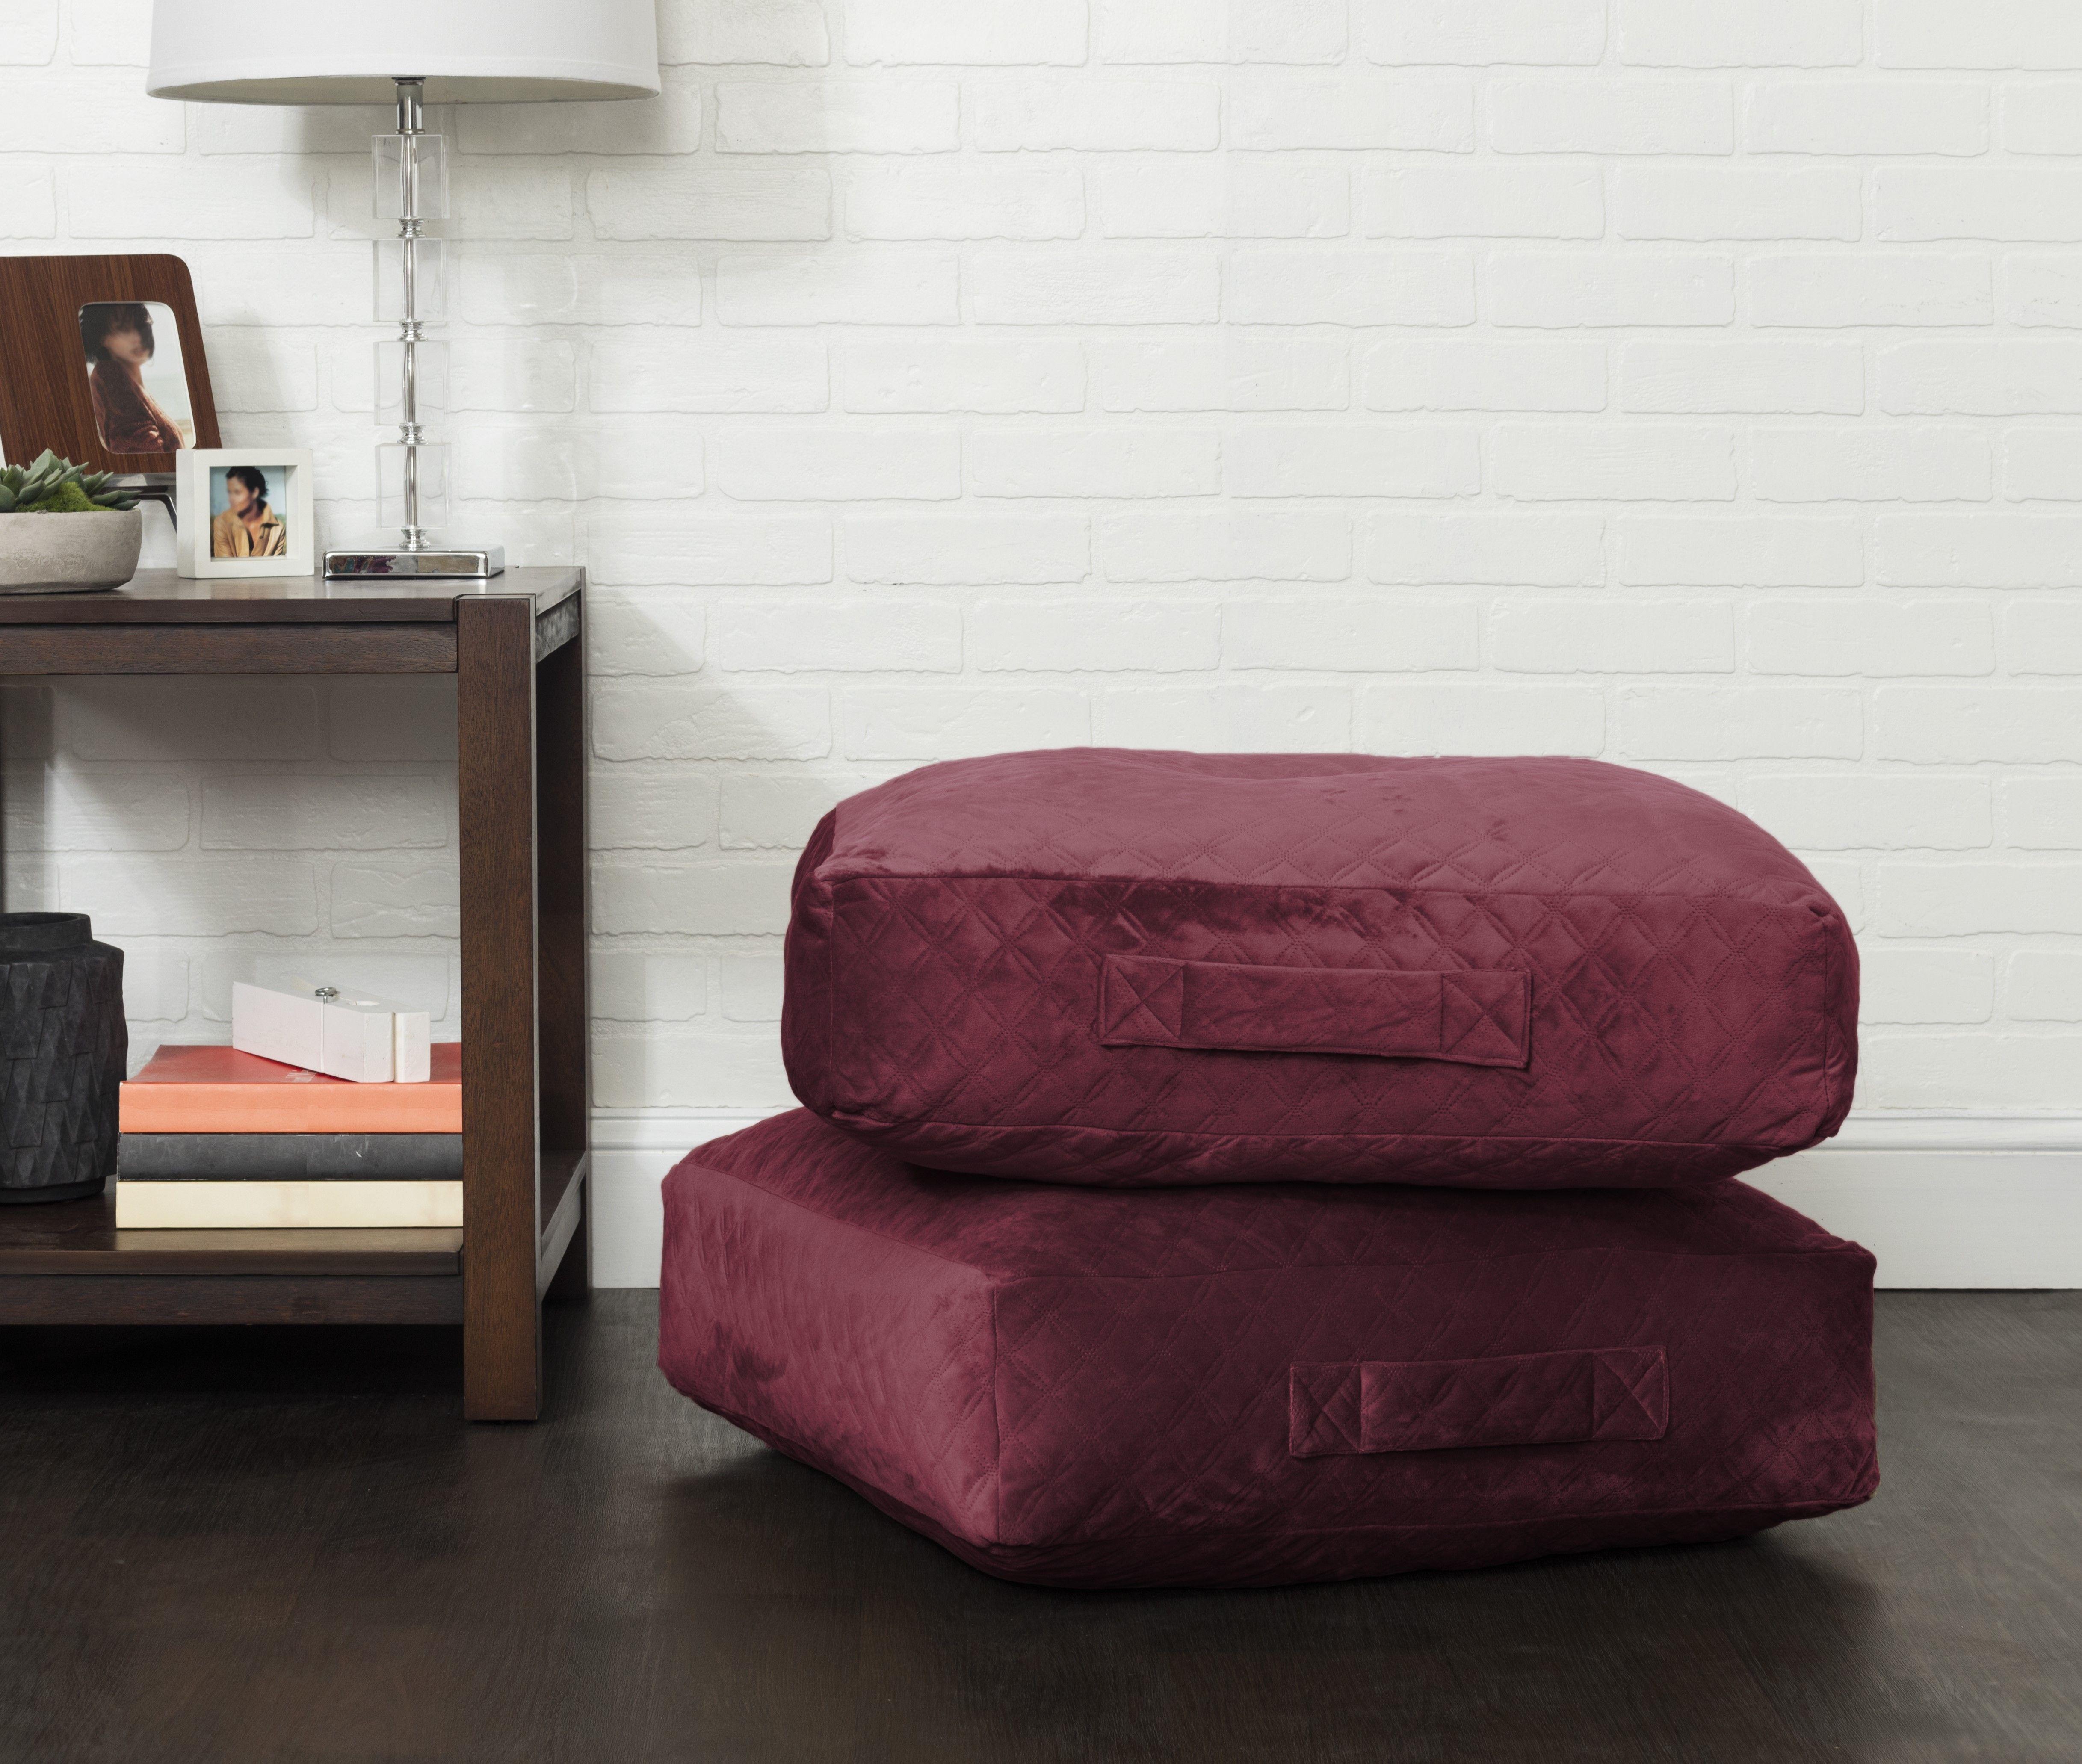 facd8a72125d94d64e4a70f02880f162 - Better Homes & Gardens Everly Velvet Box Floor Cushion